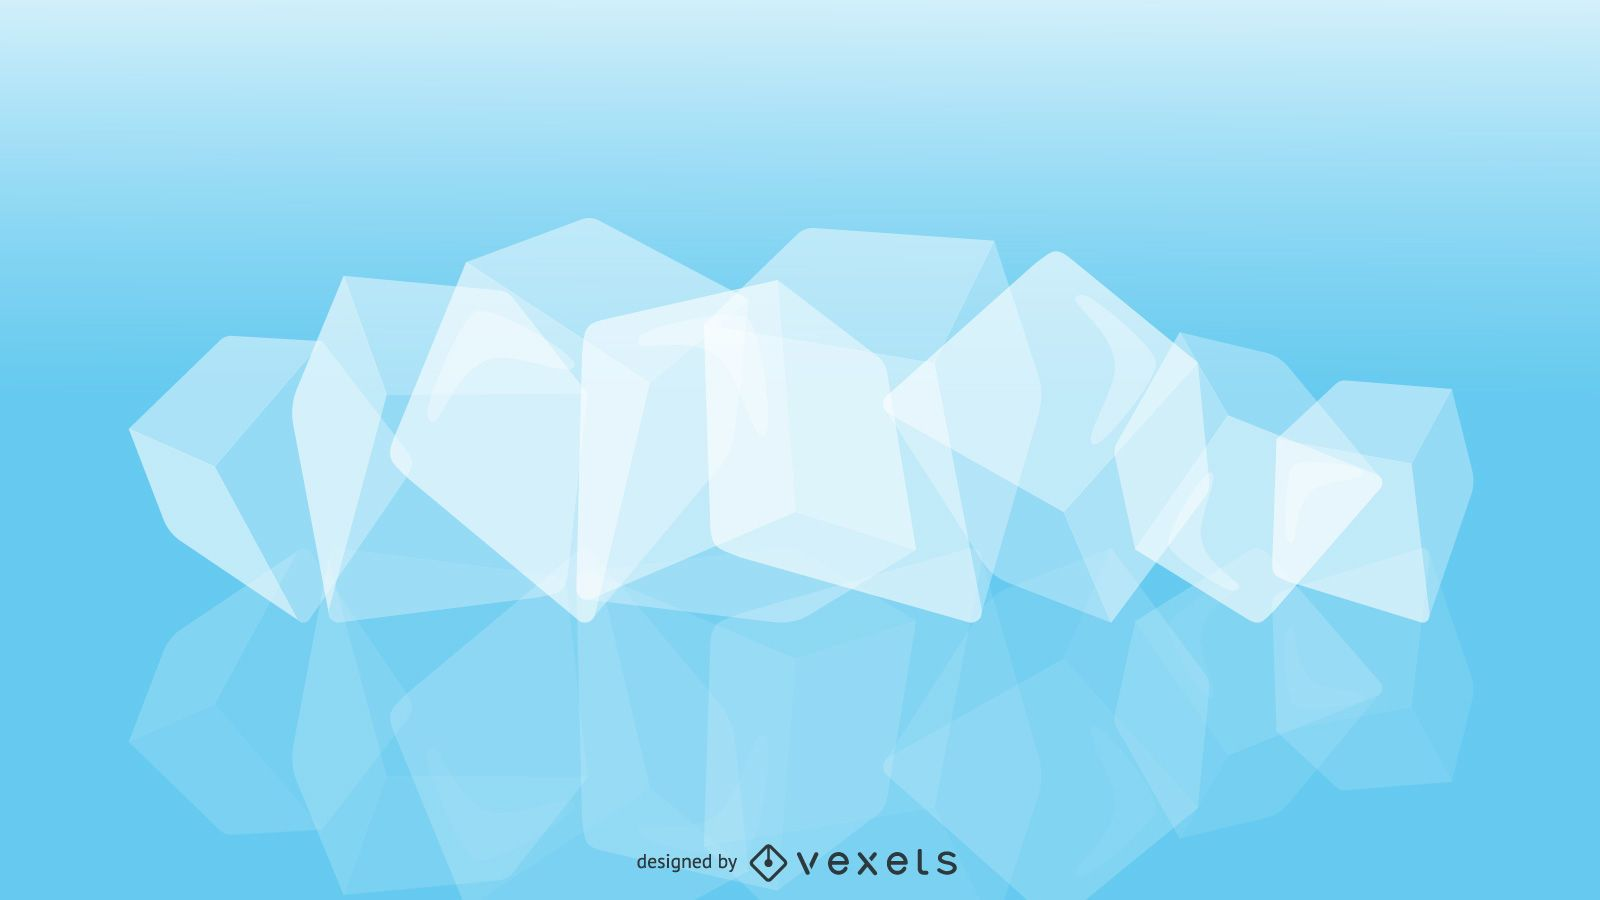 Ice cubes illustration design